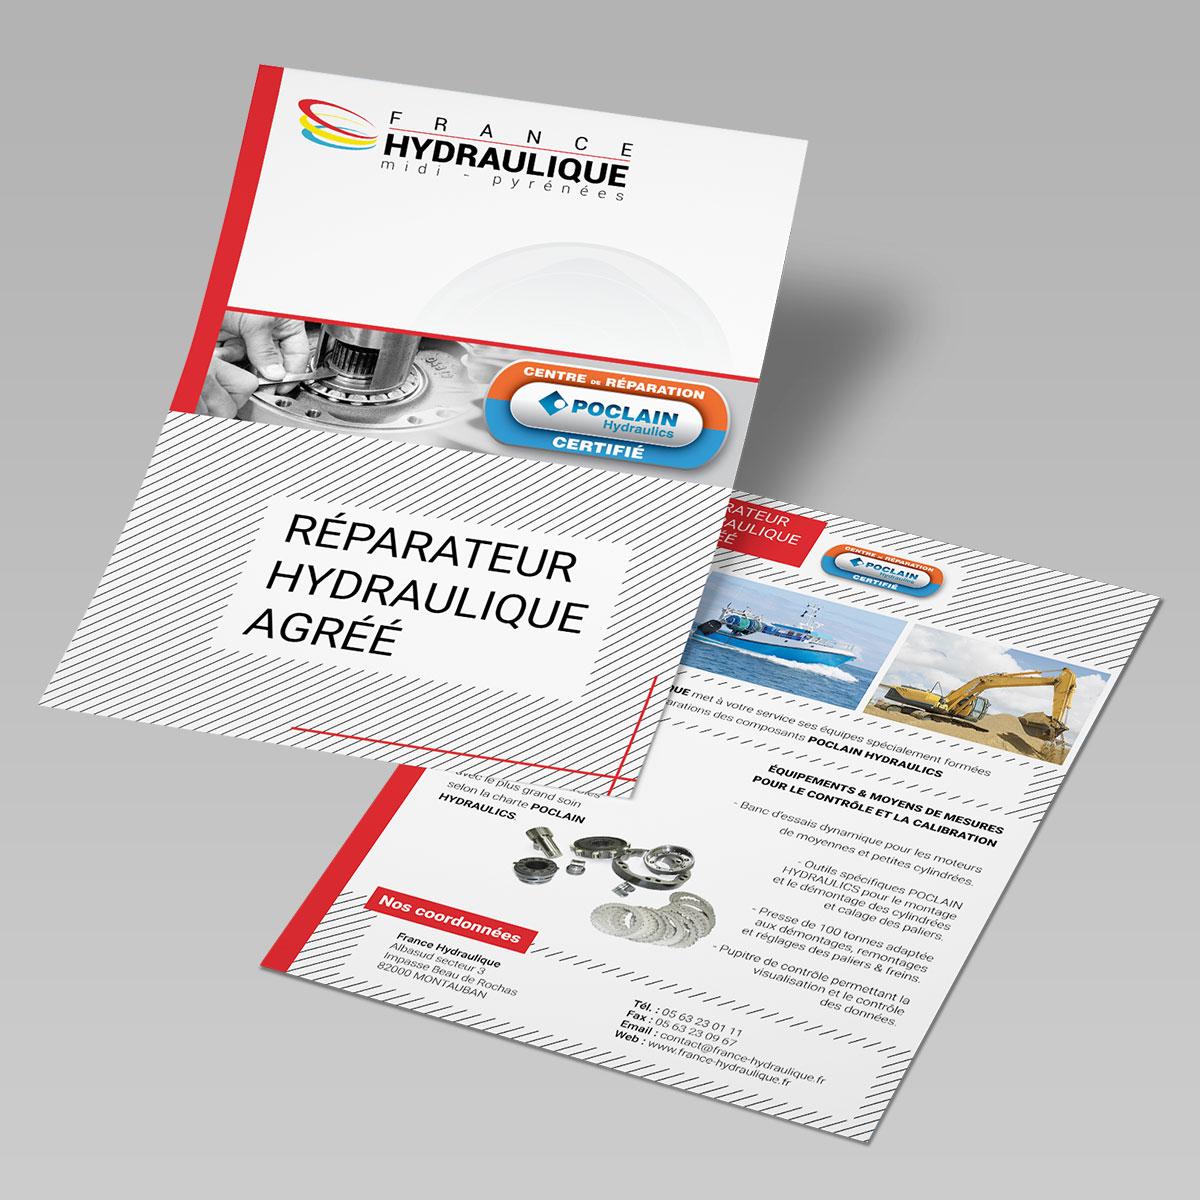 feuillet france hydraulique poclain hydraulics